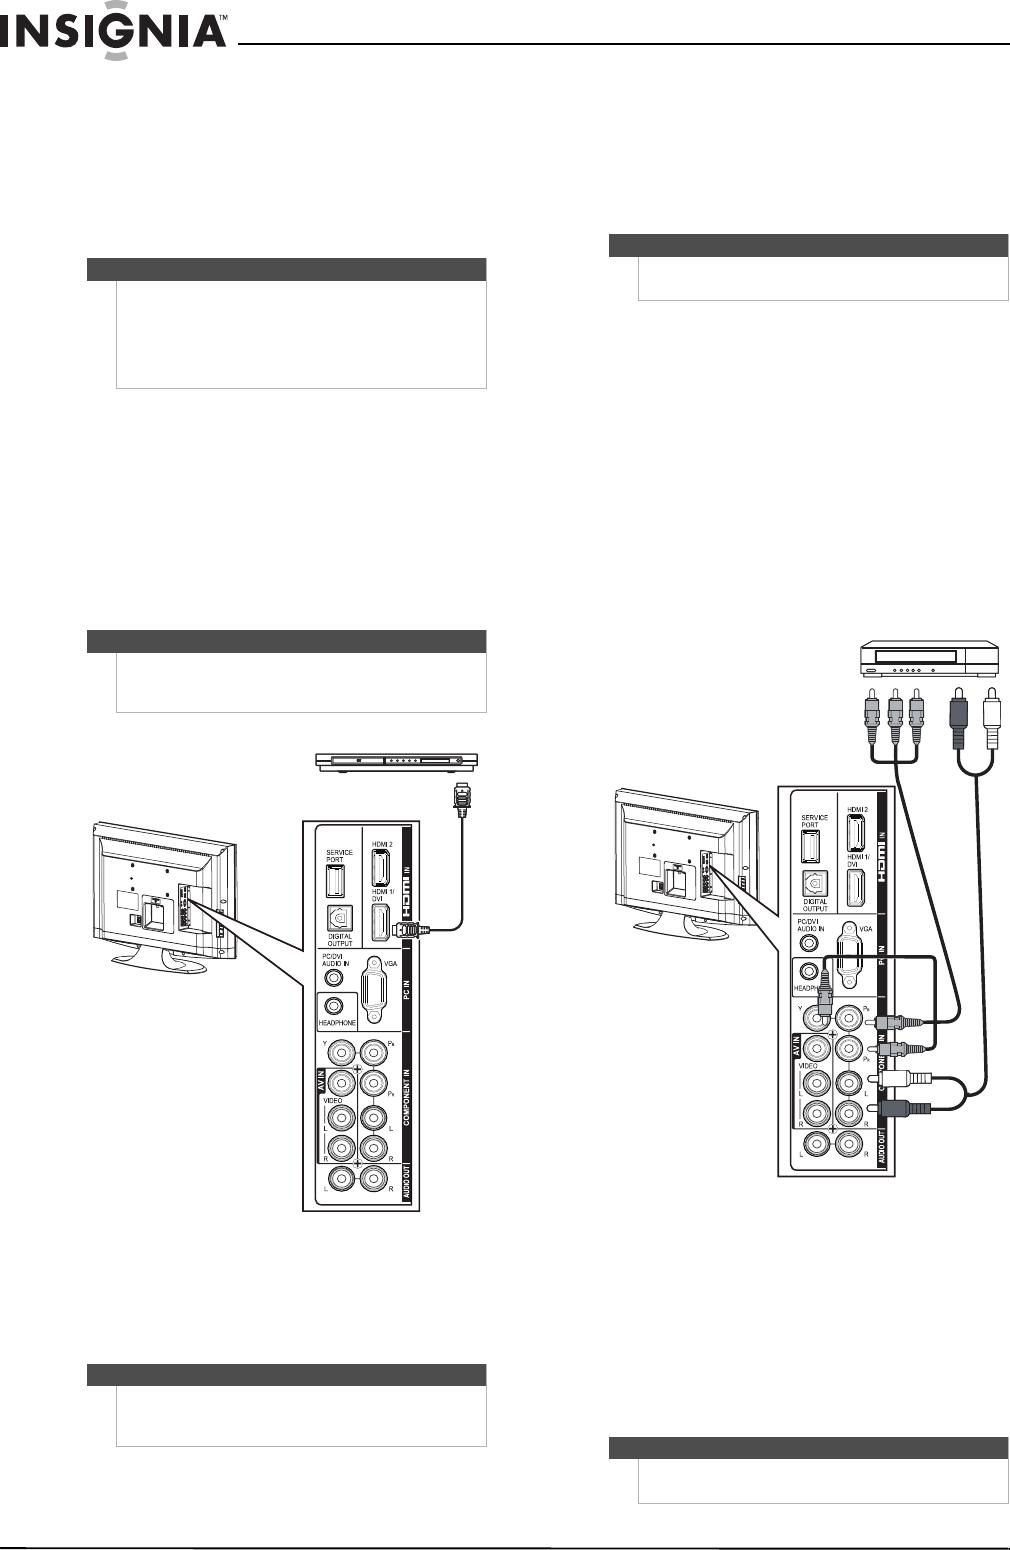 Insignia Ns 32l430a11 User Manual To The 06bf8e02 08d9 4fa2 B74b 1966 Mustang Philco Radio Wiring Diagram 14